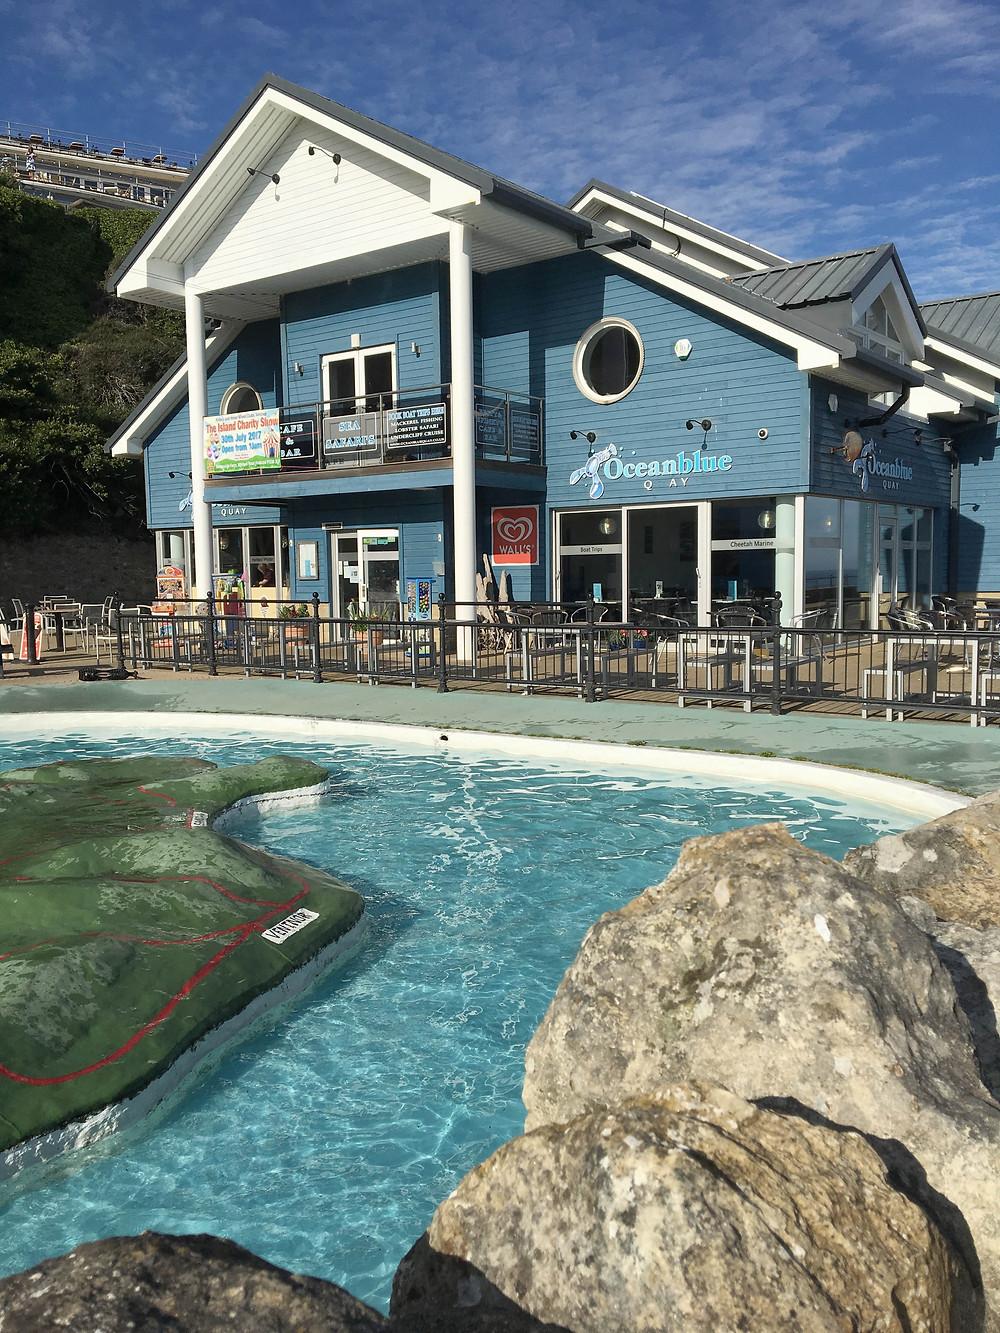 Ventnor Paddling Pool